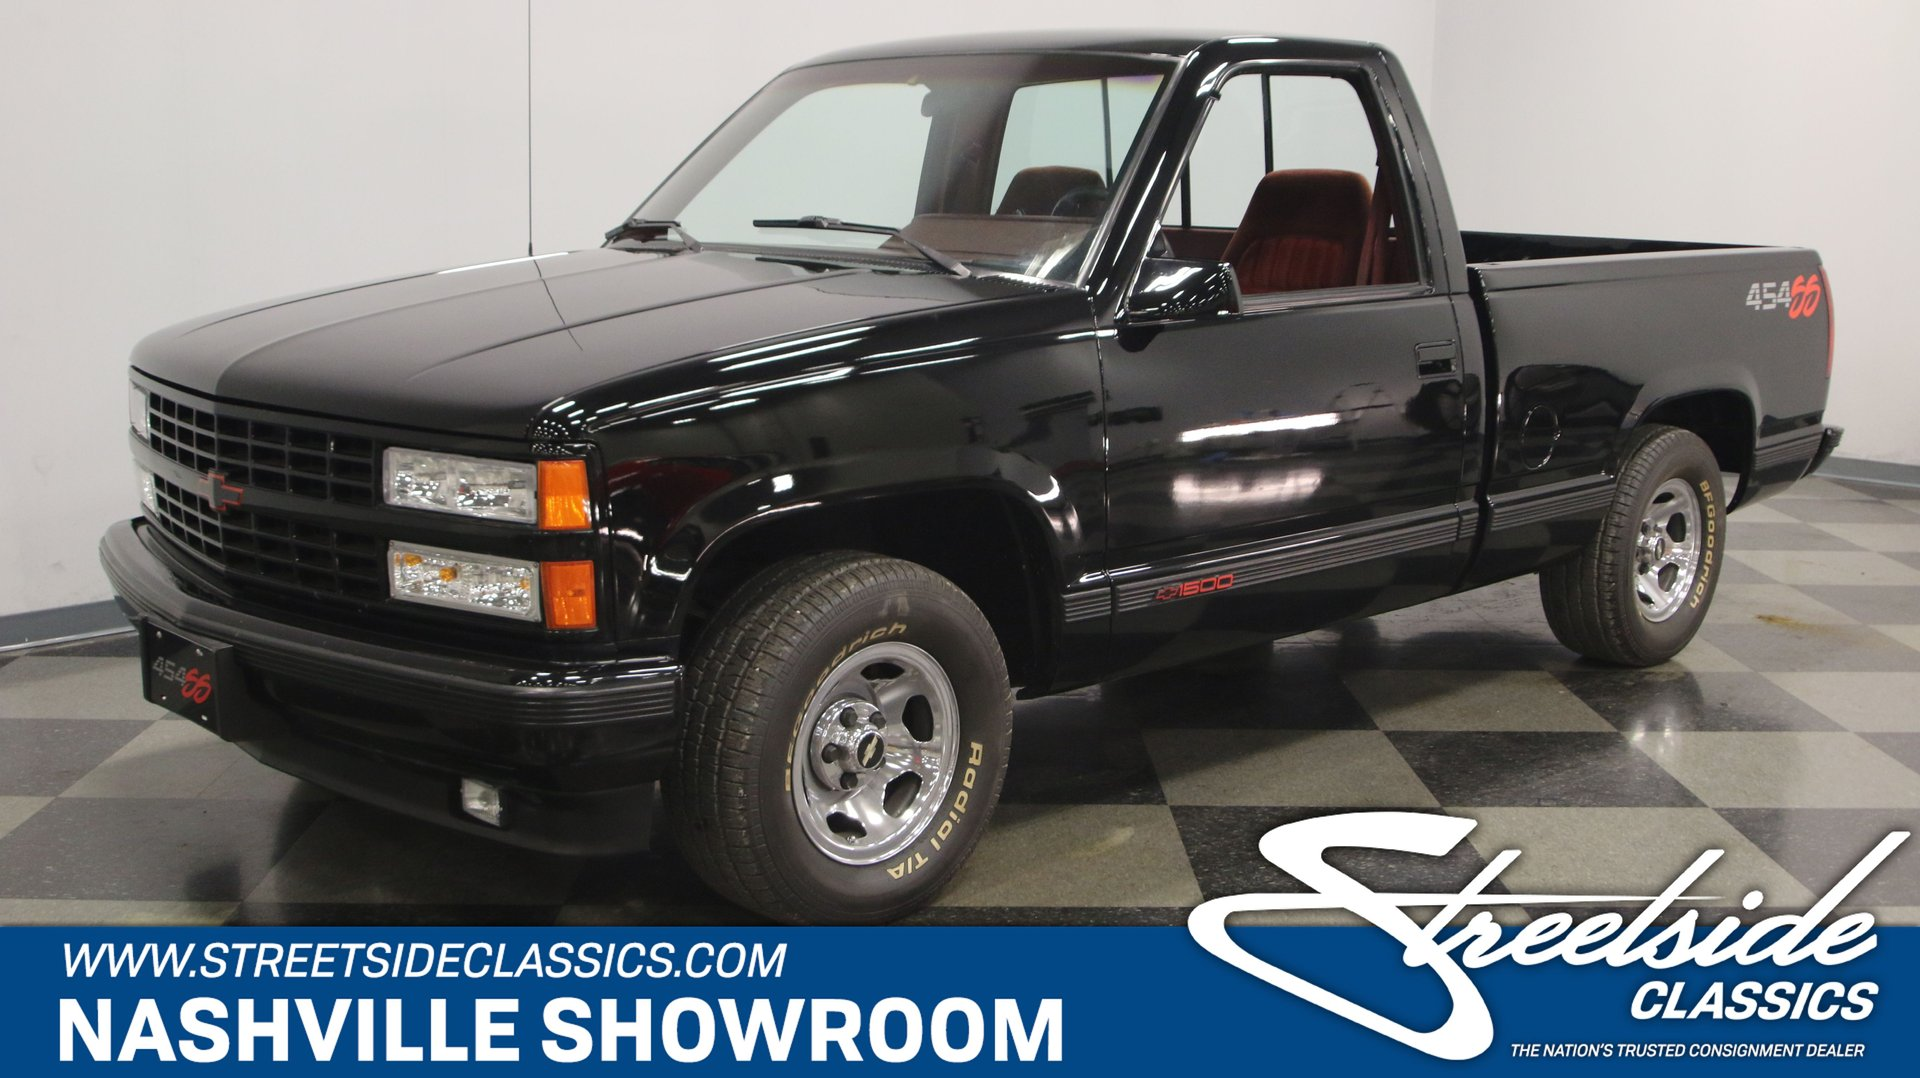 1992 Chevrolet Silverado 454 SS for sale #64261 | Motorious